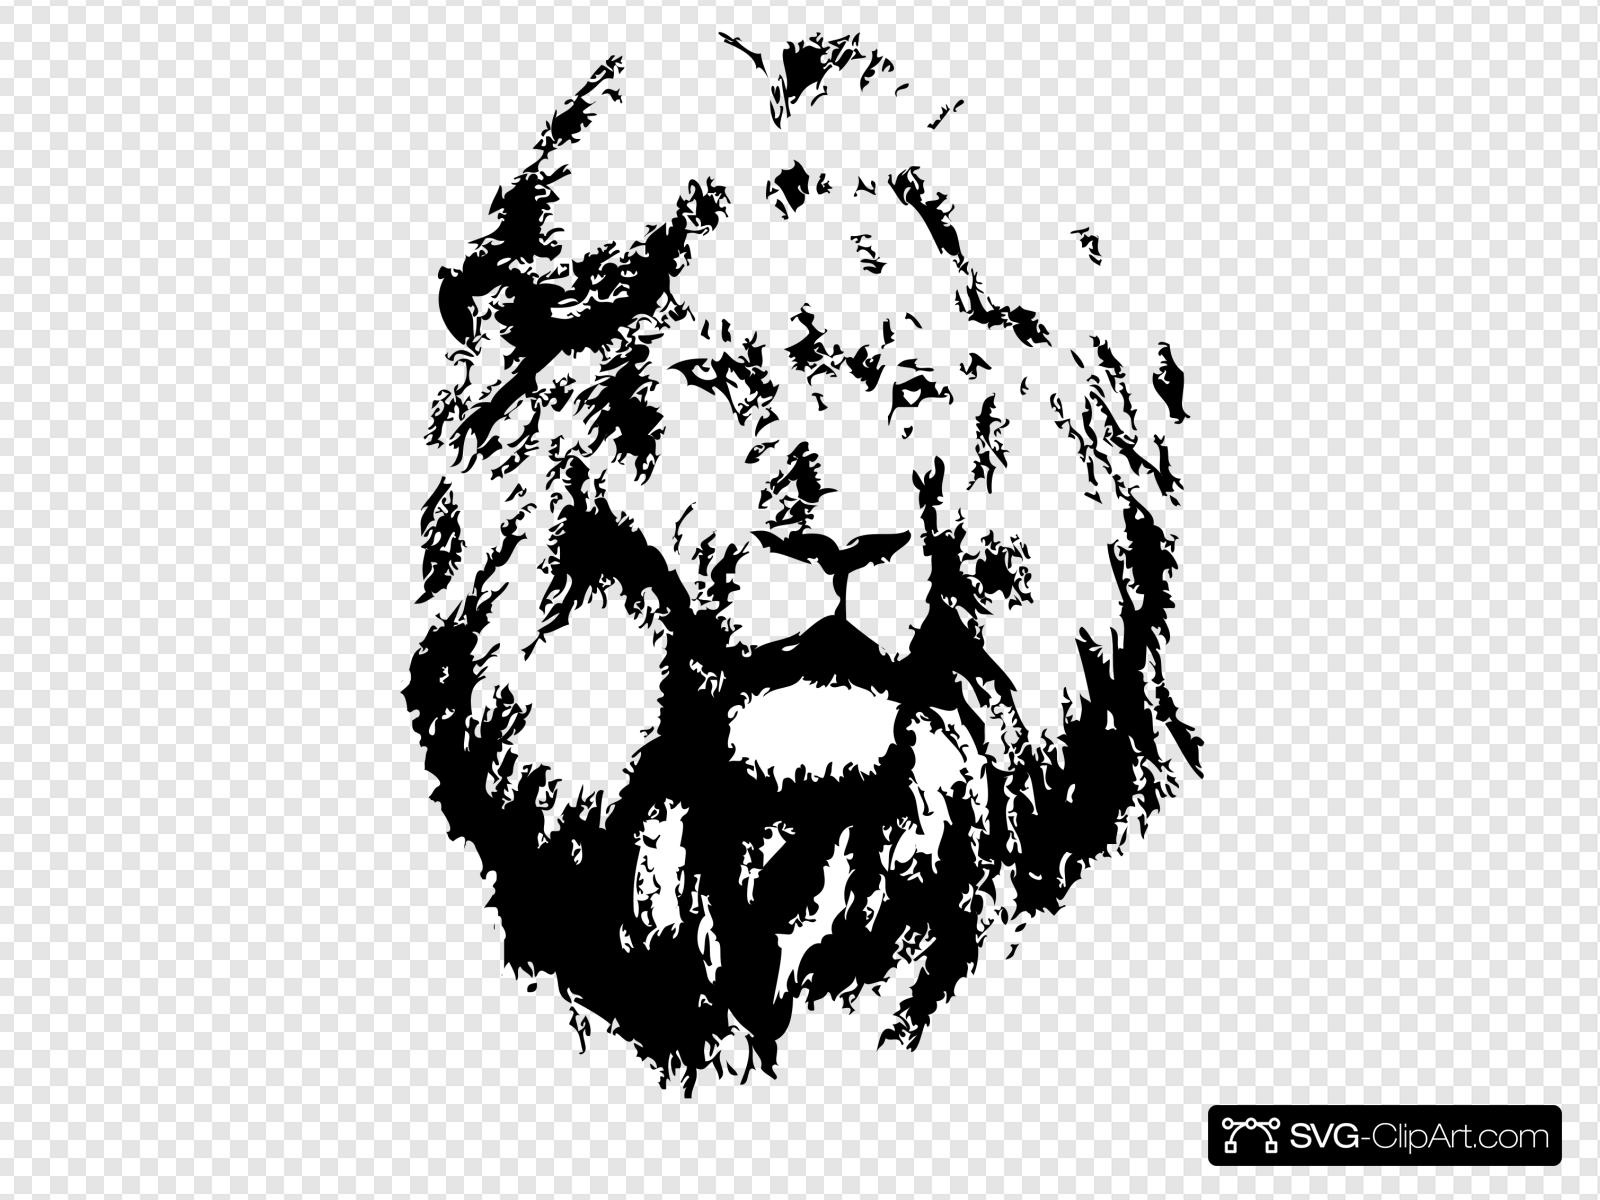 Black lion clipart picture free download Black Lion Clip art, Icon and SVG - SVG Clipart picture free download